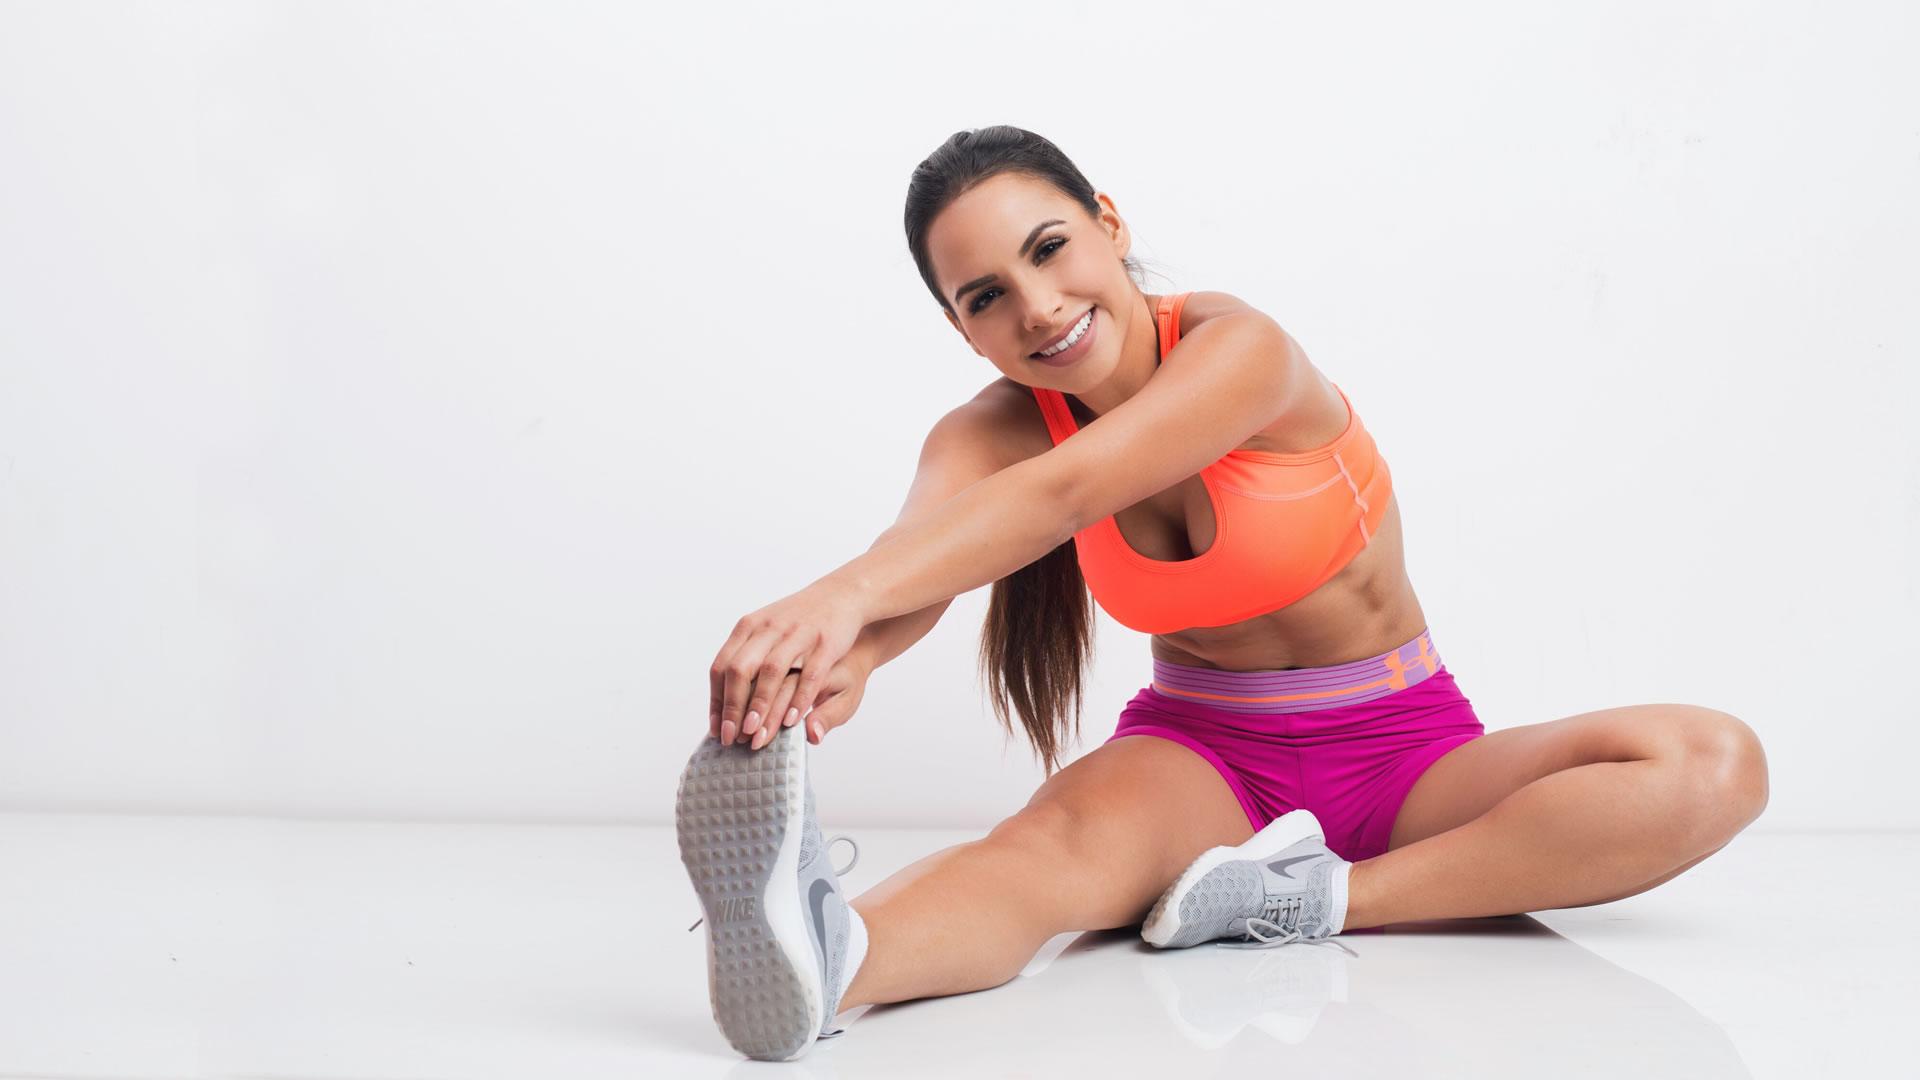 Lisa Morales Fitness